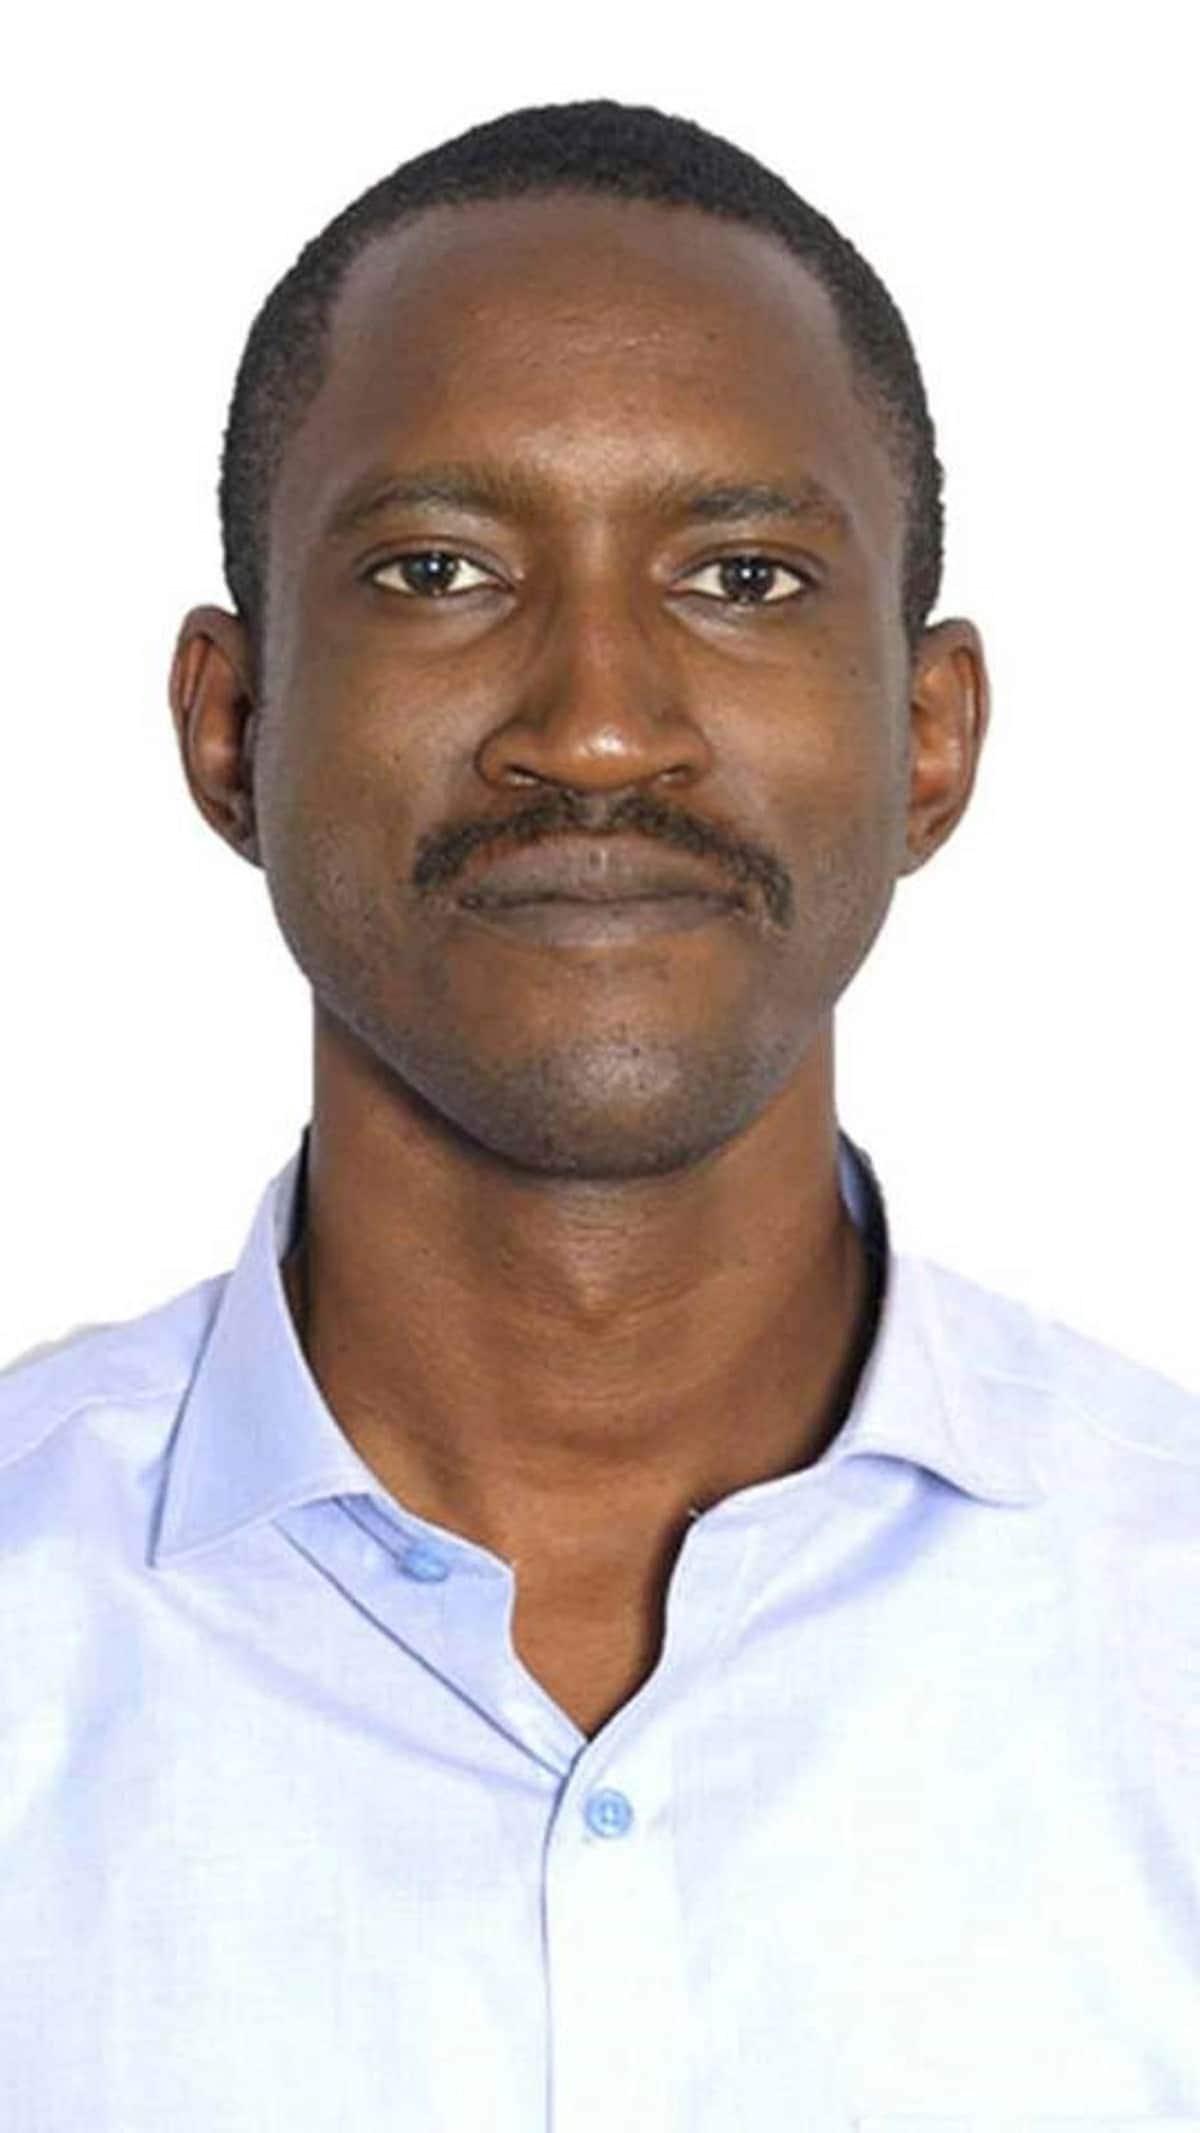 Gregory Nyauchi, mwanamme aliyefanikiwa kuirejesha Moi Day afafanua sababu zake